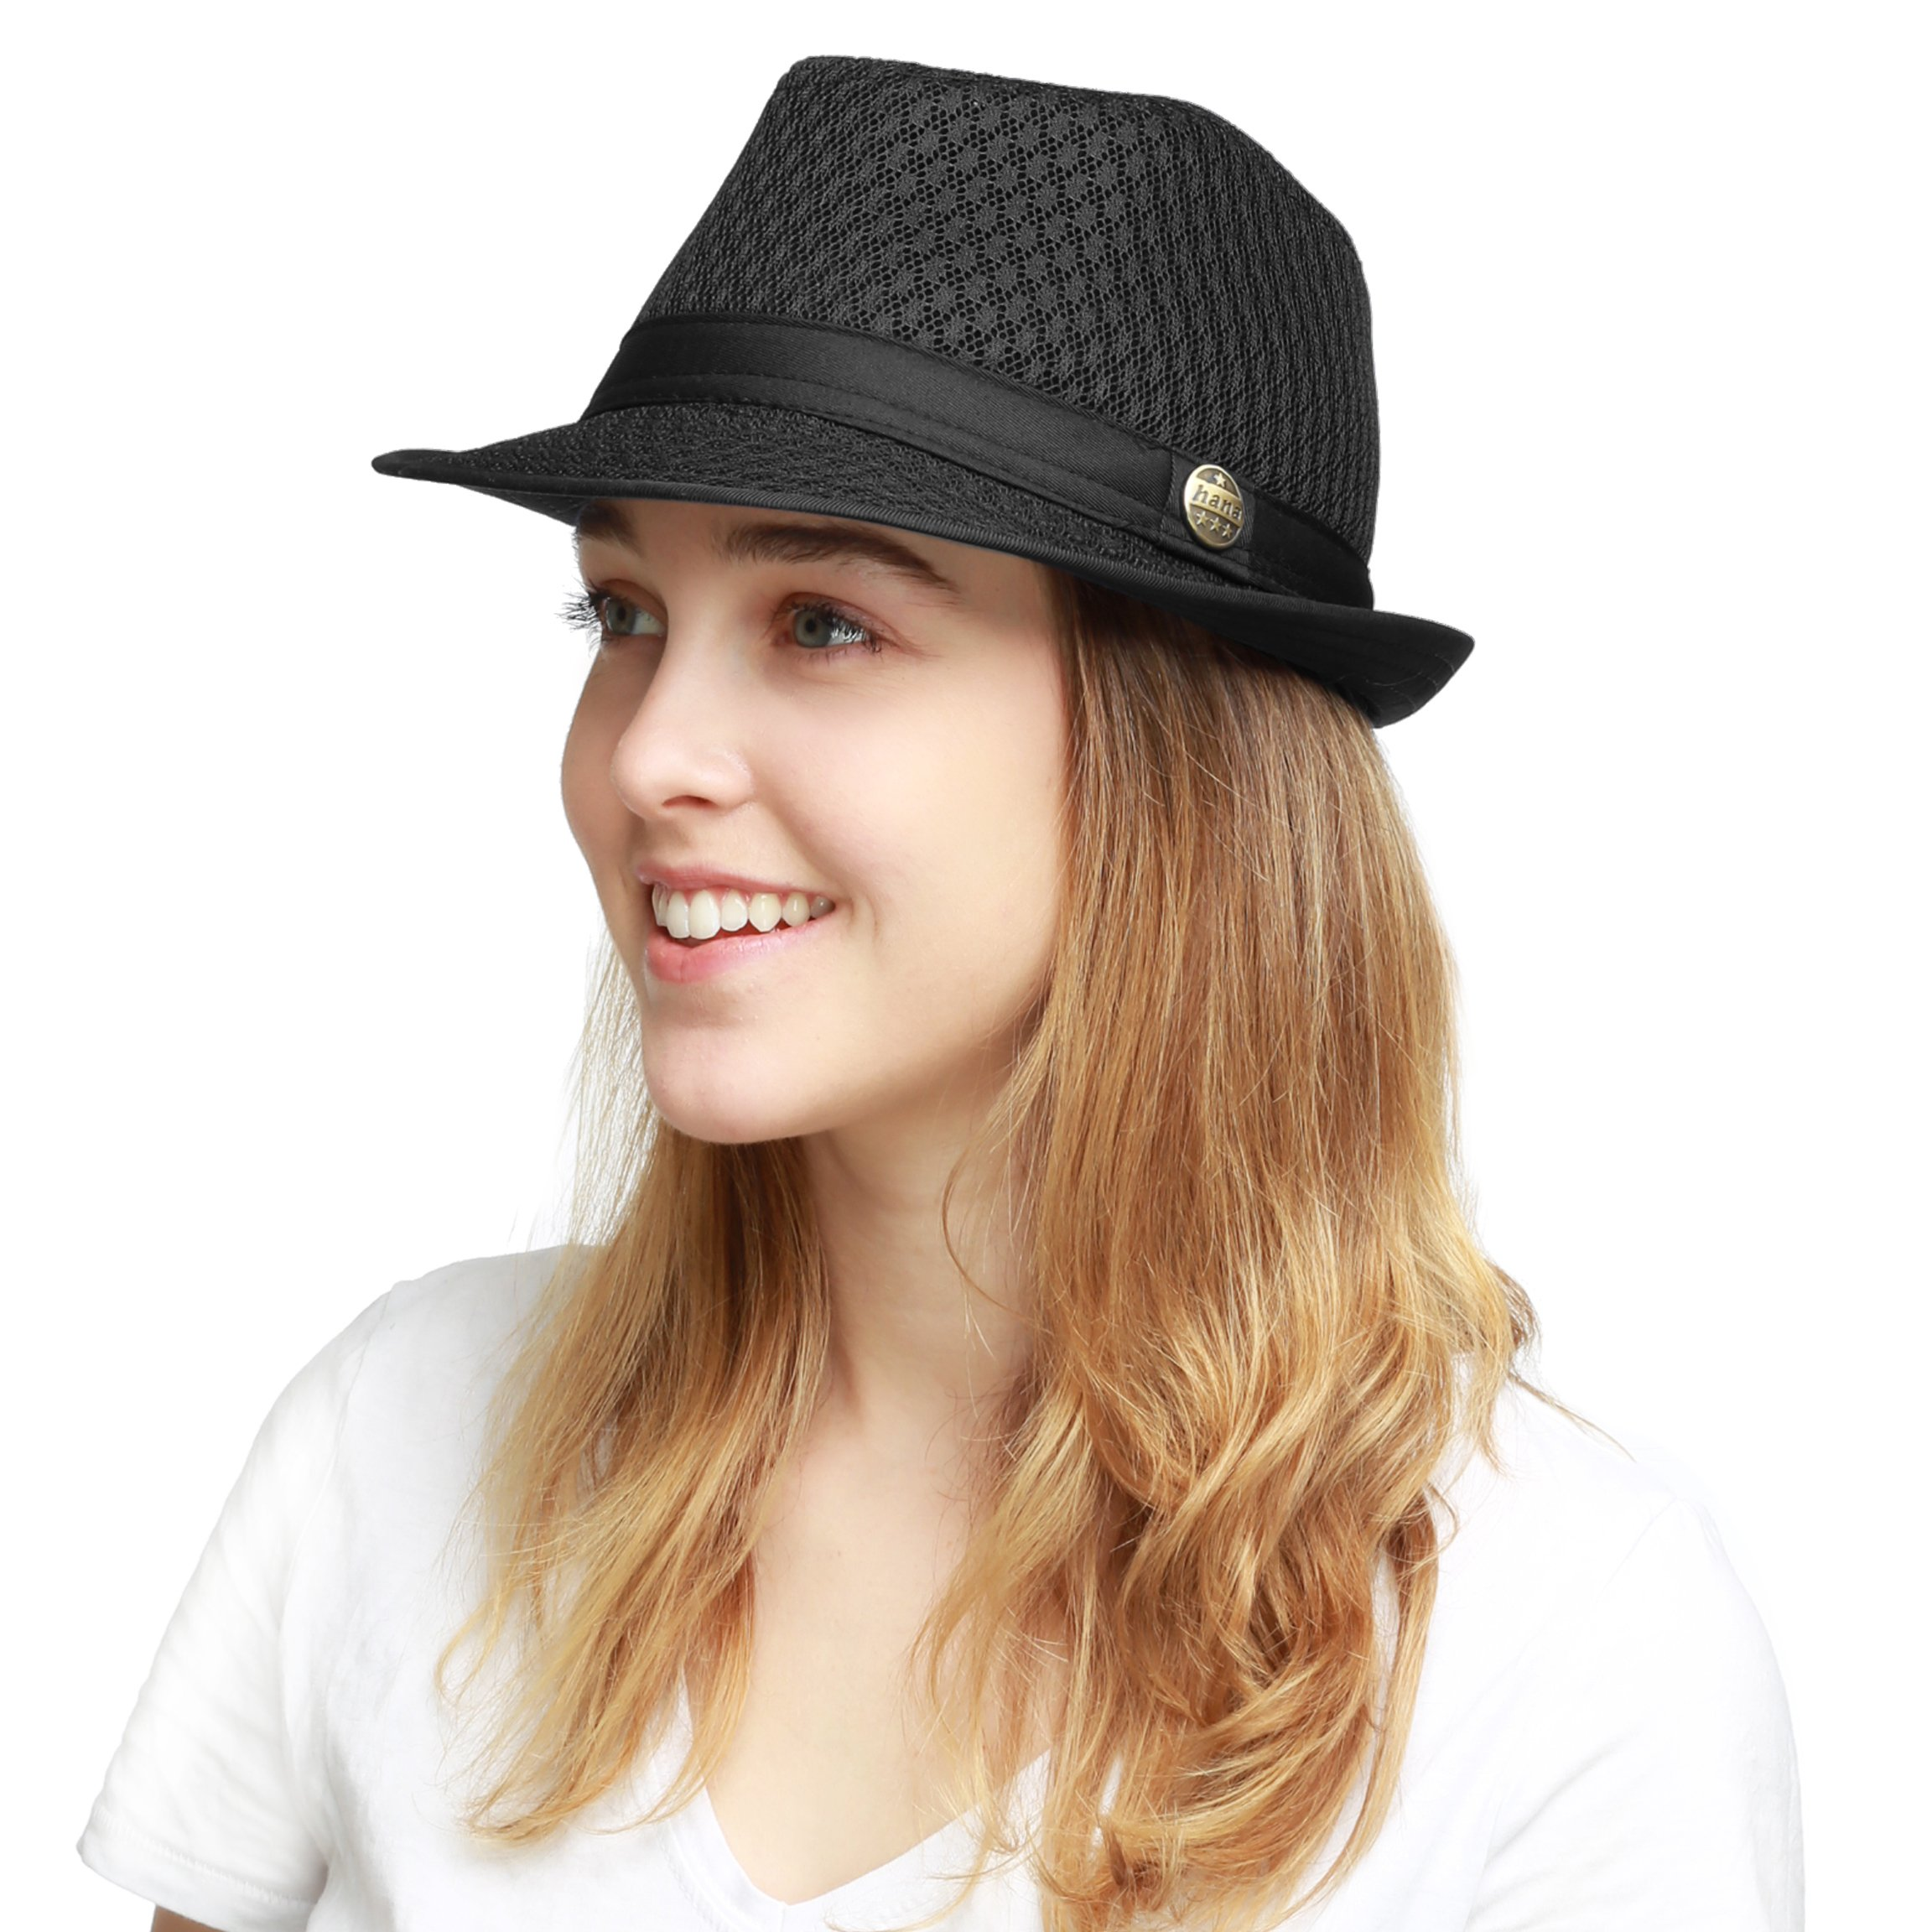 THE HAT DEPOT 200G1015 Classic Cool Soft Mesh Fedora hat (S/M, Black)